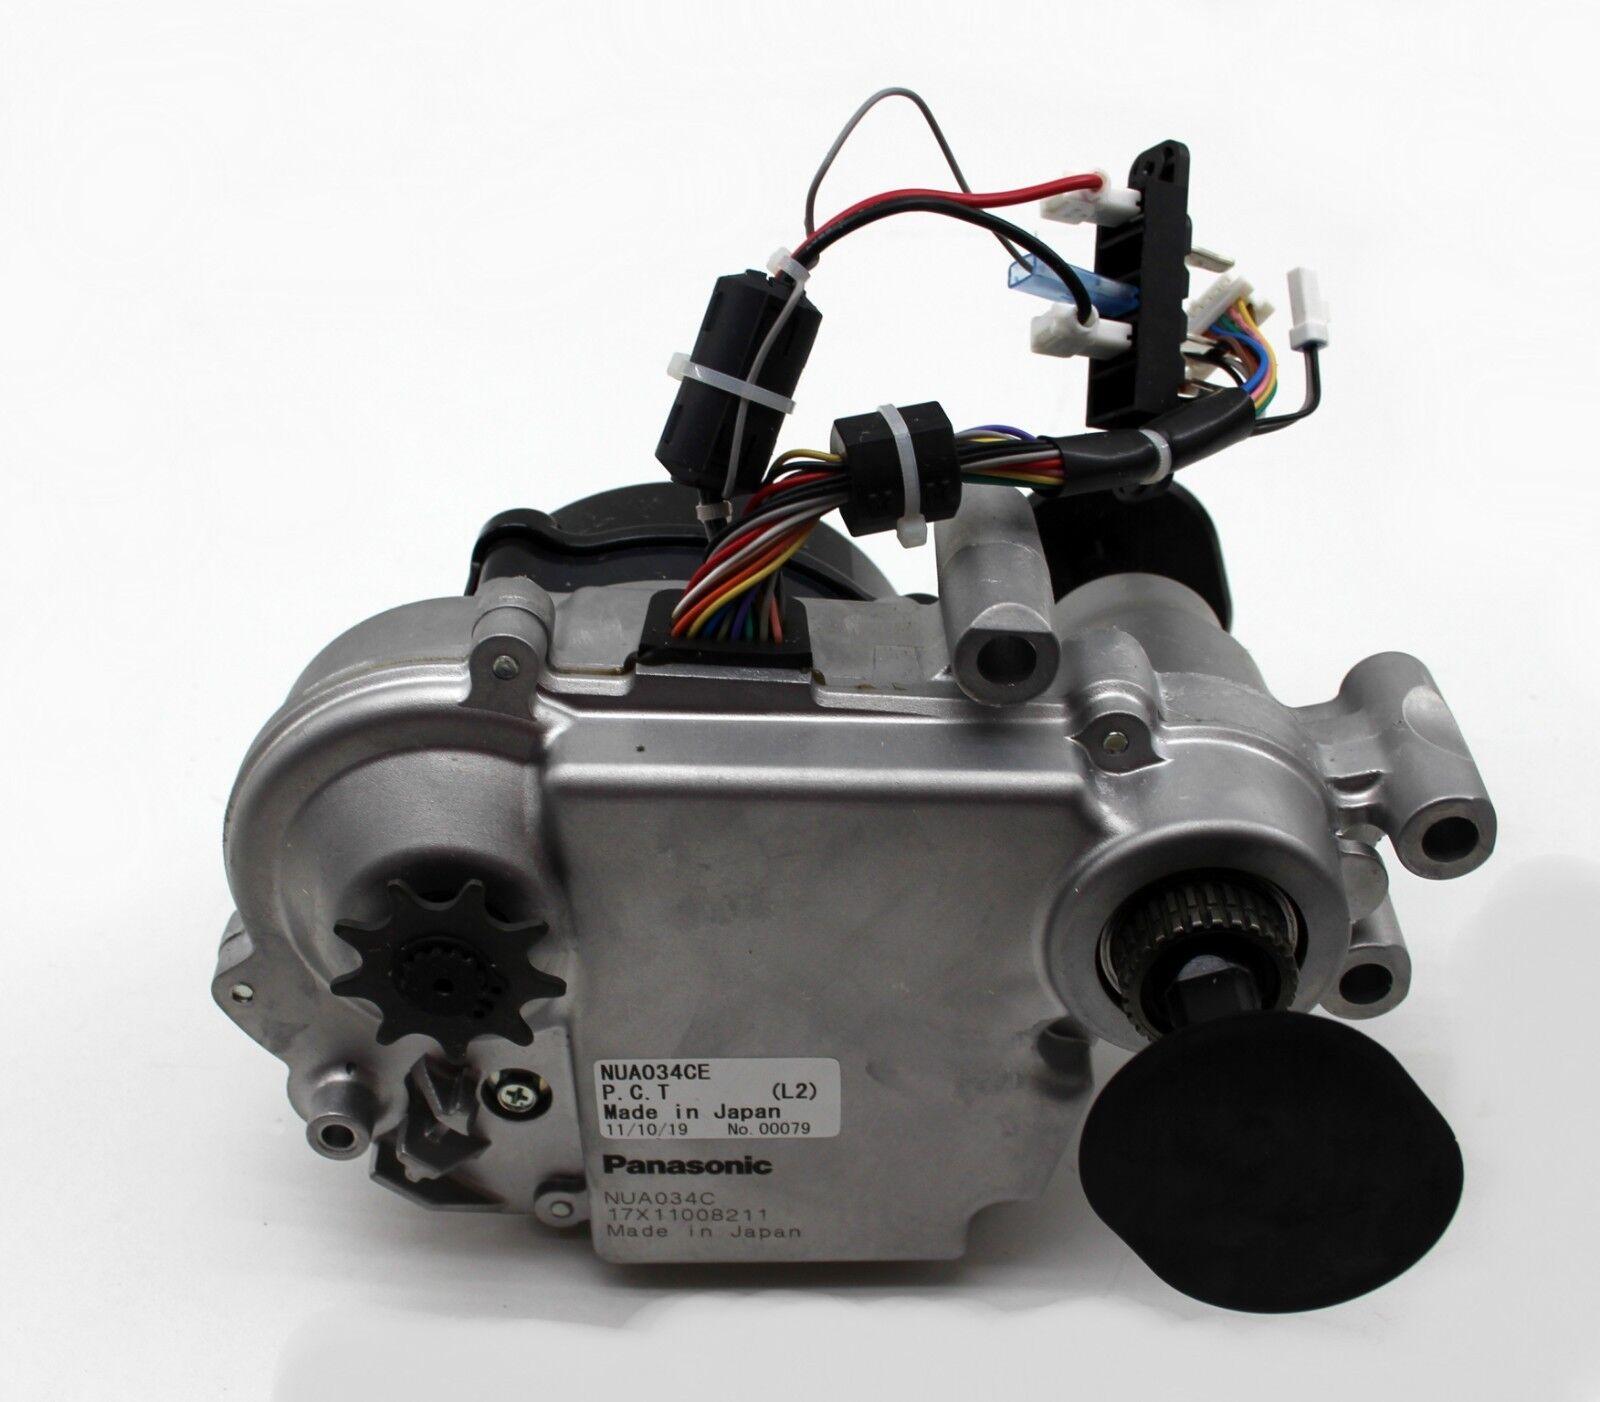 Panasonic Elektro Motor für  45 km h E-Bike Speed Panasonic NUA034HB, L2  incredible discounts